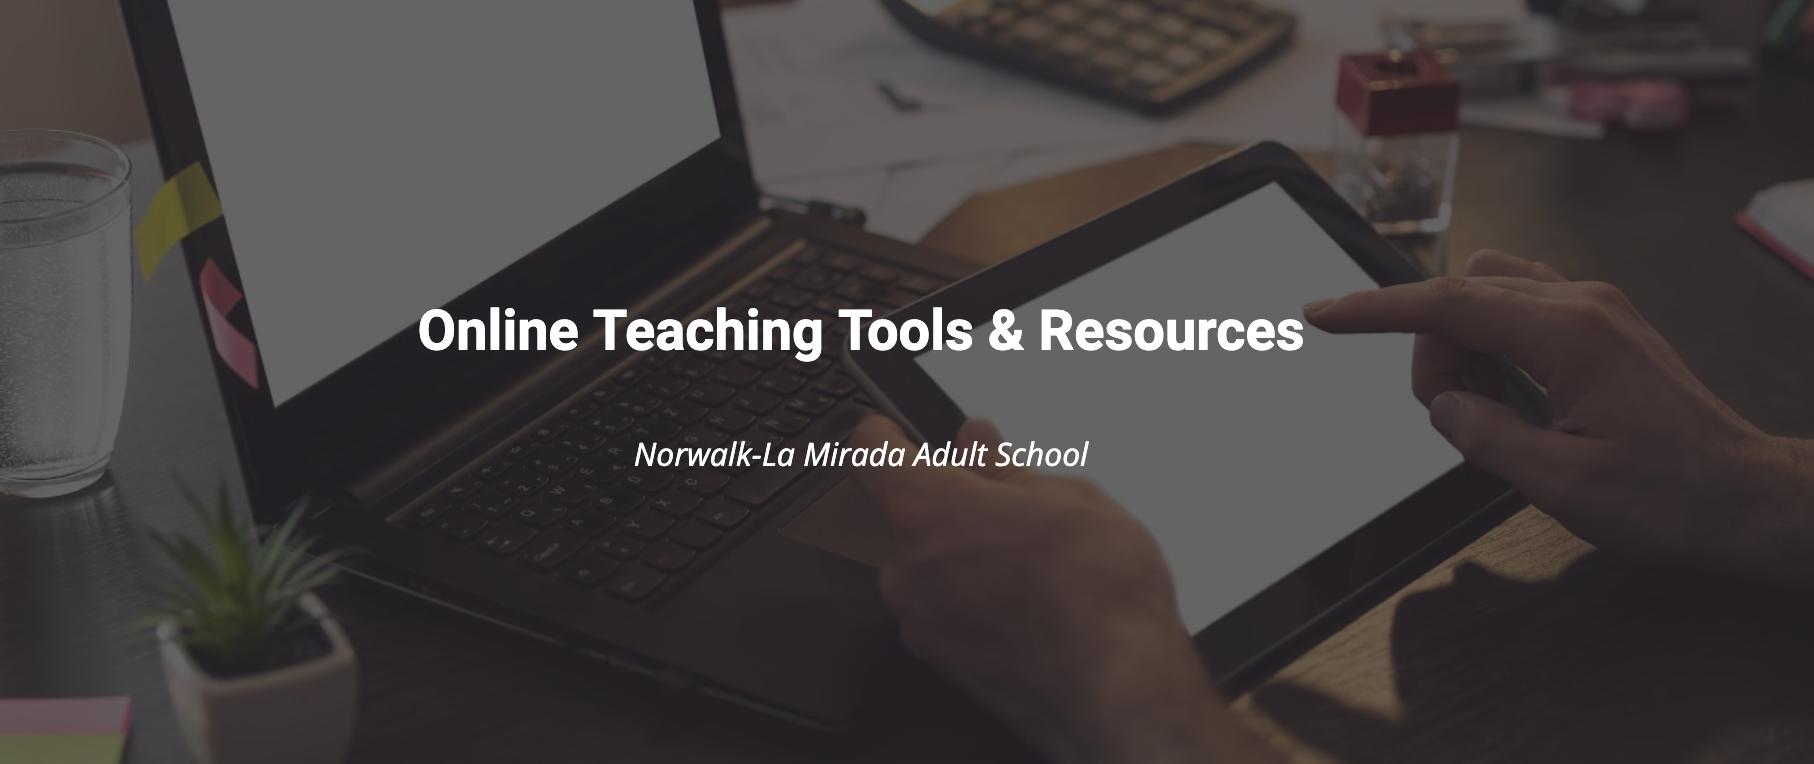 Tutorials for Online Teaching